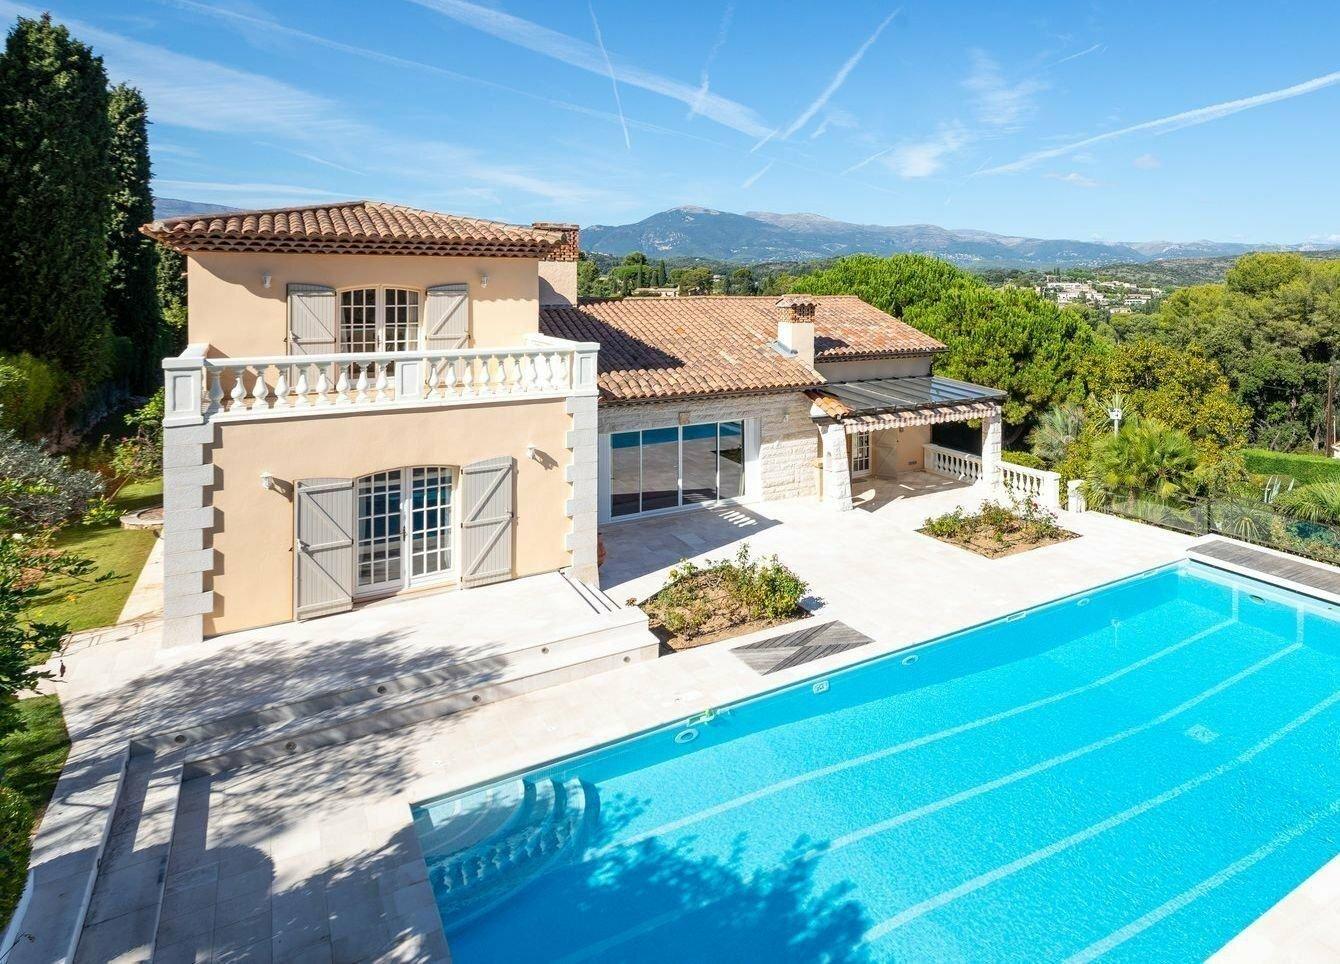 Villa in Biot, Provence-Alpes-Côte d'Azur, France 1